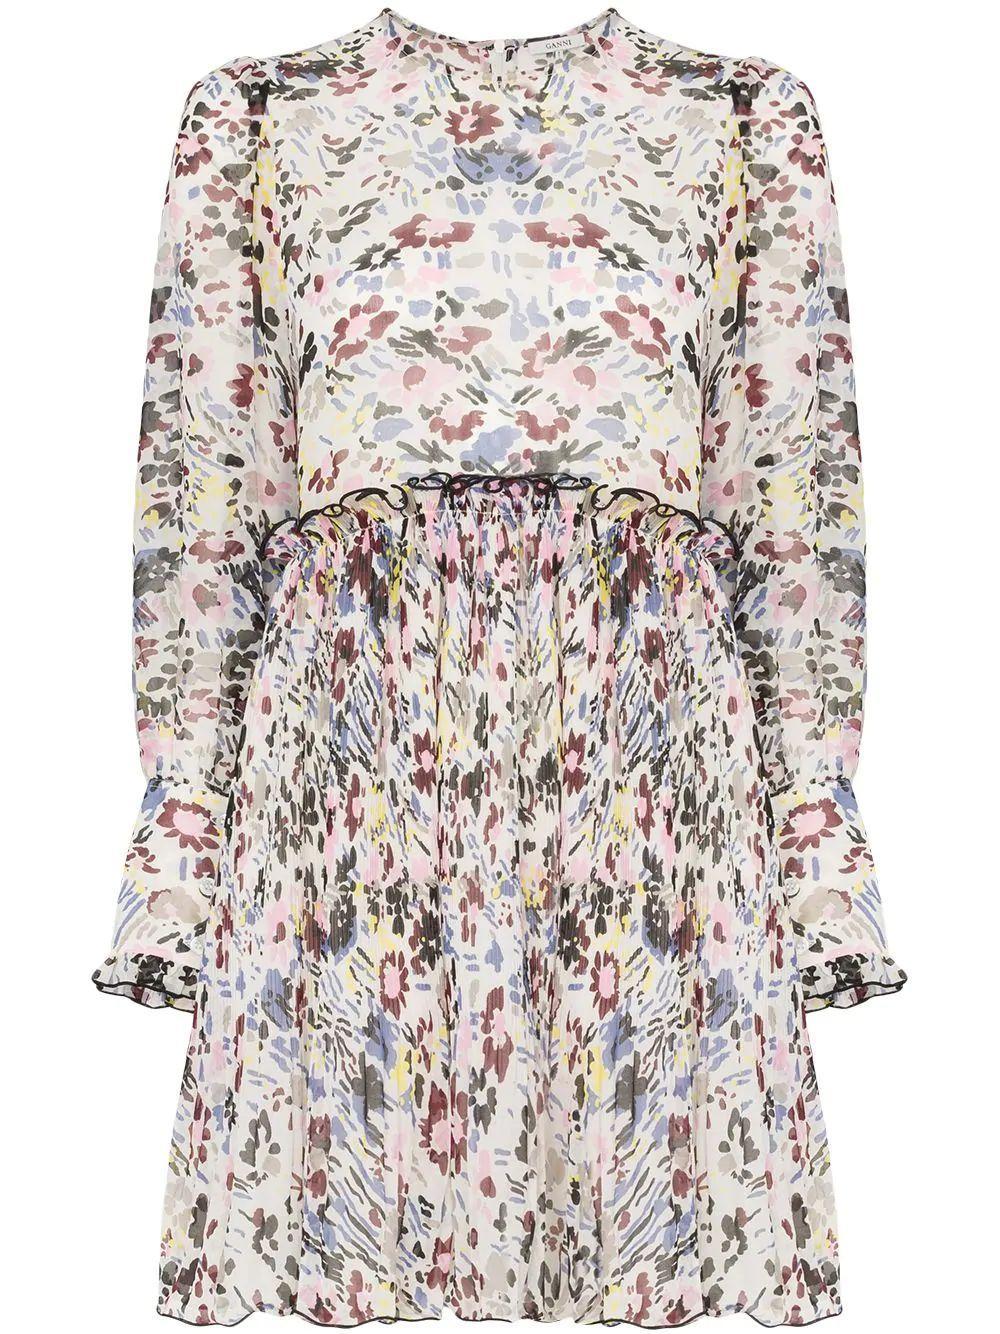 Floral Pleated Longsleeve Dress Item # F3401